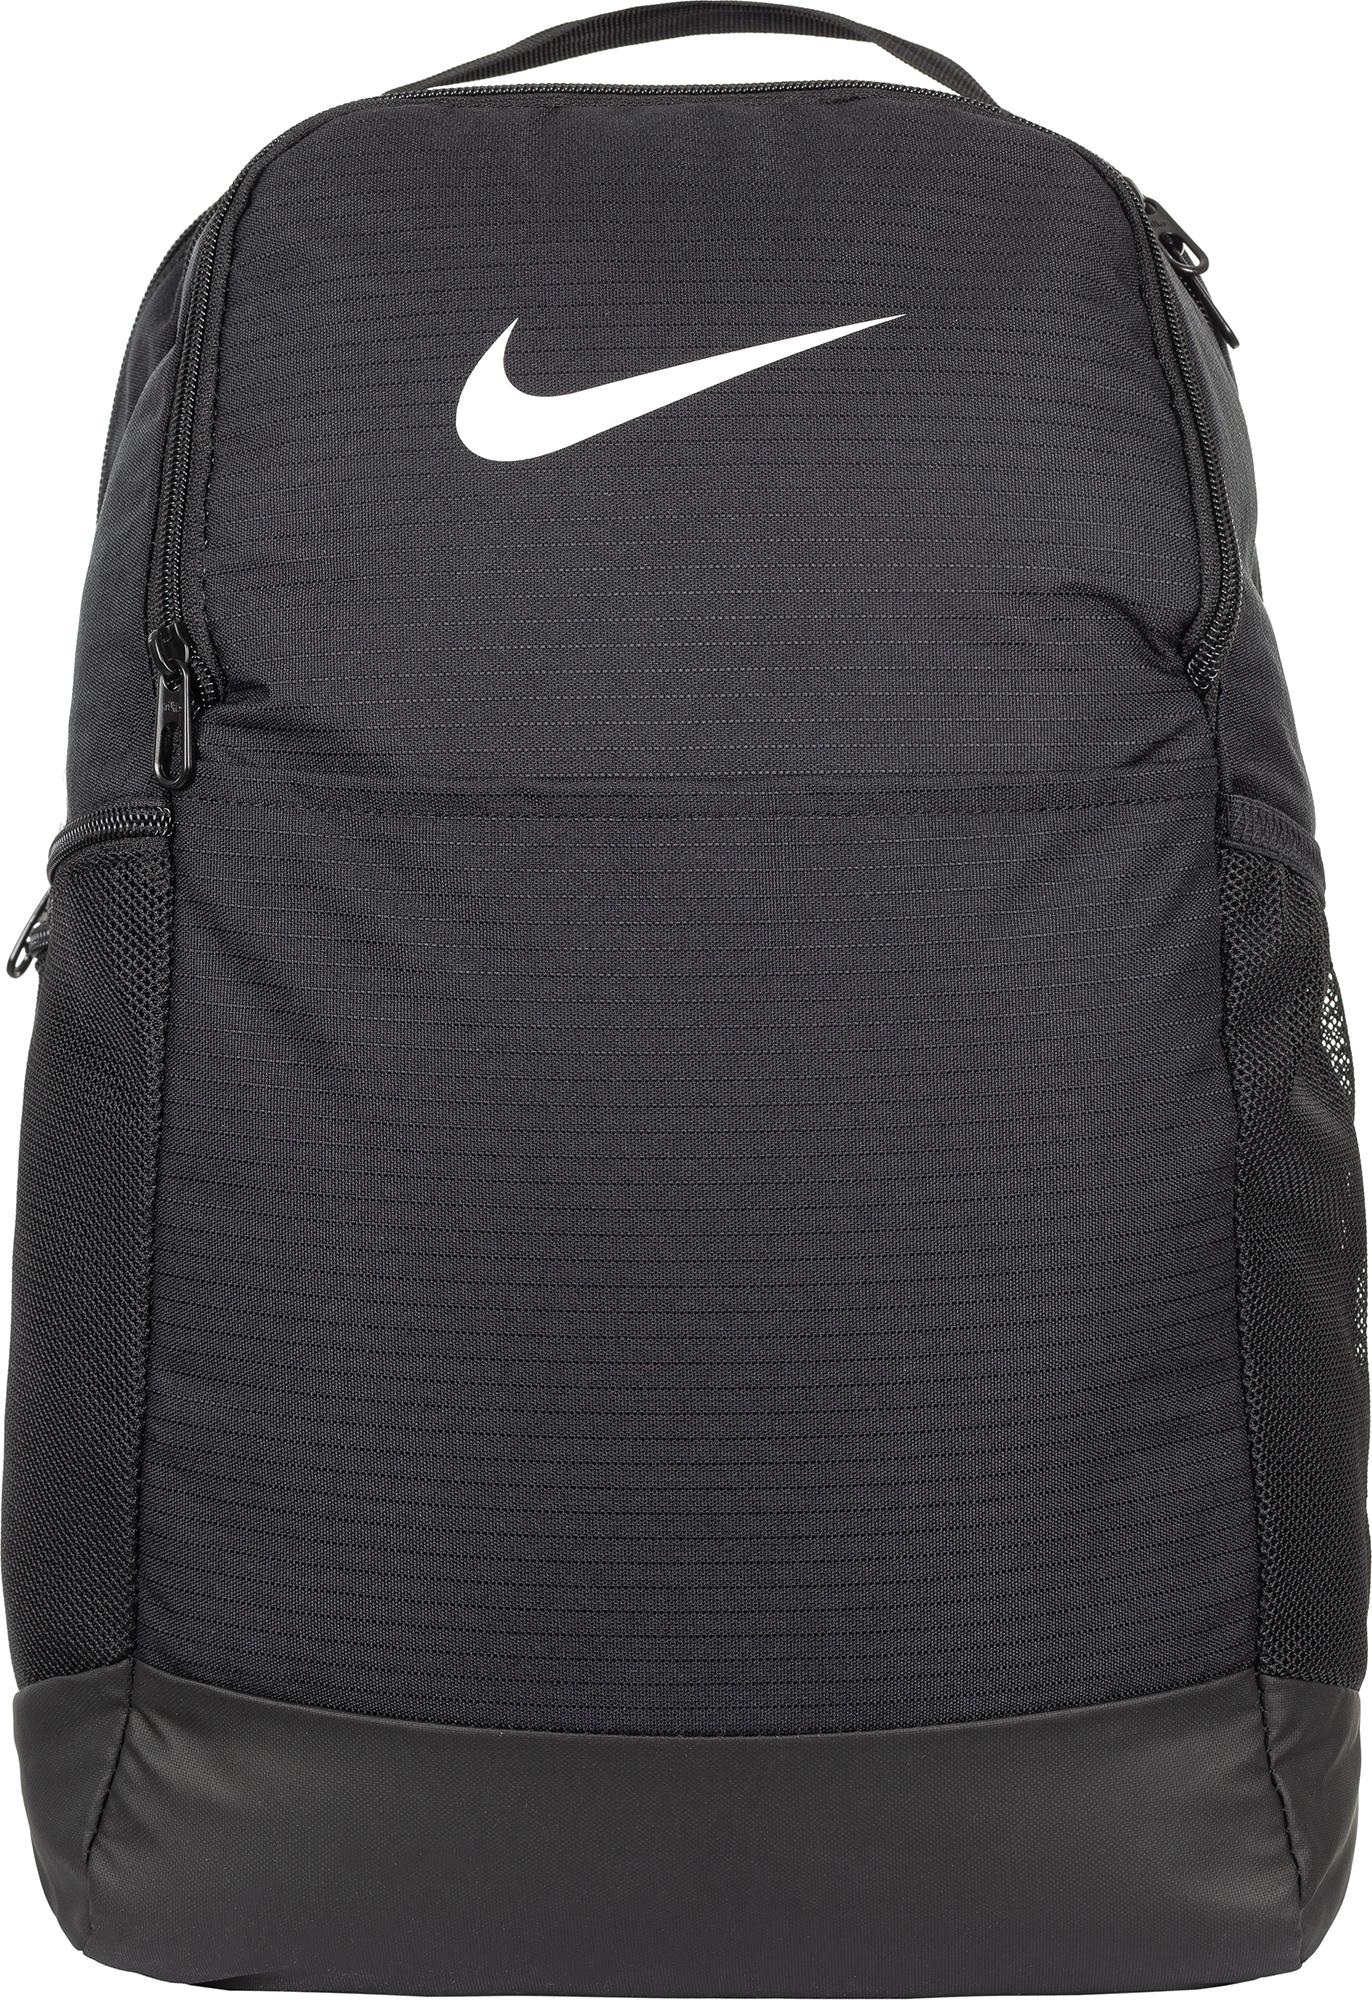 Nike Рюкзак Nike Brasilia все цены